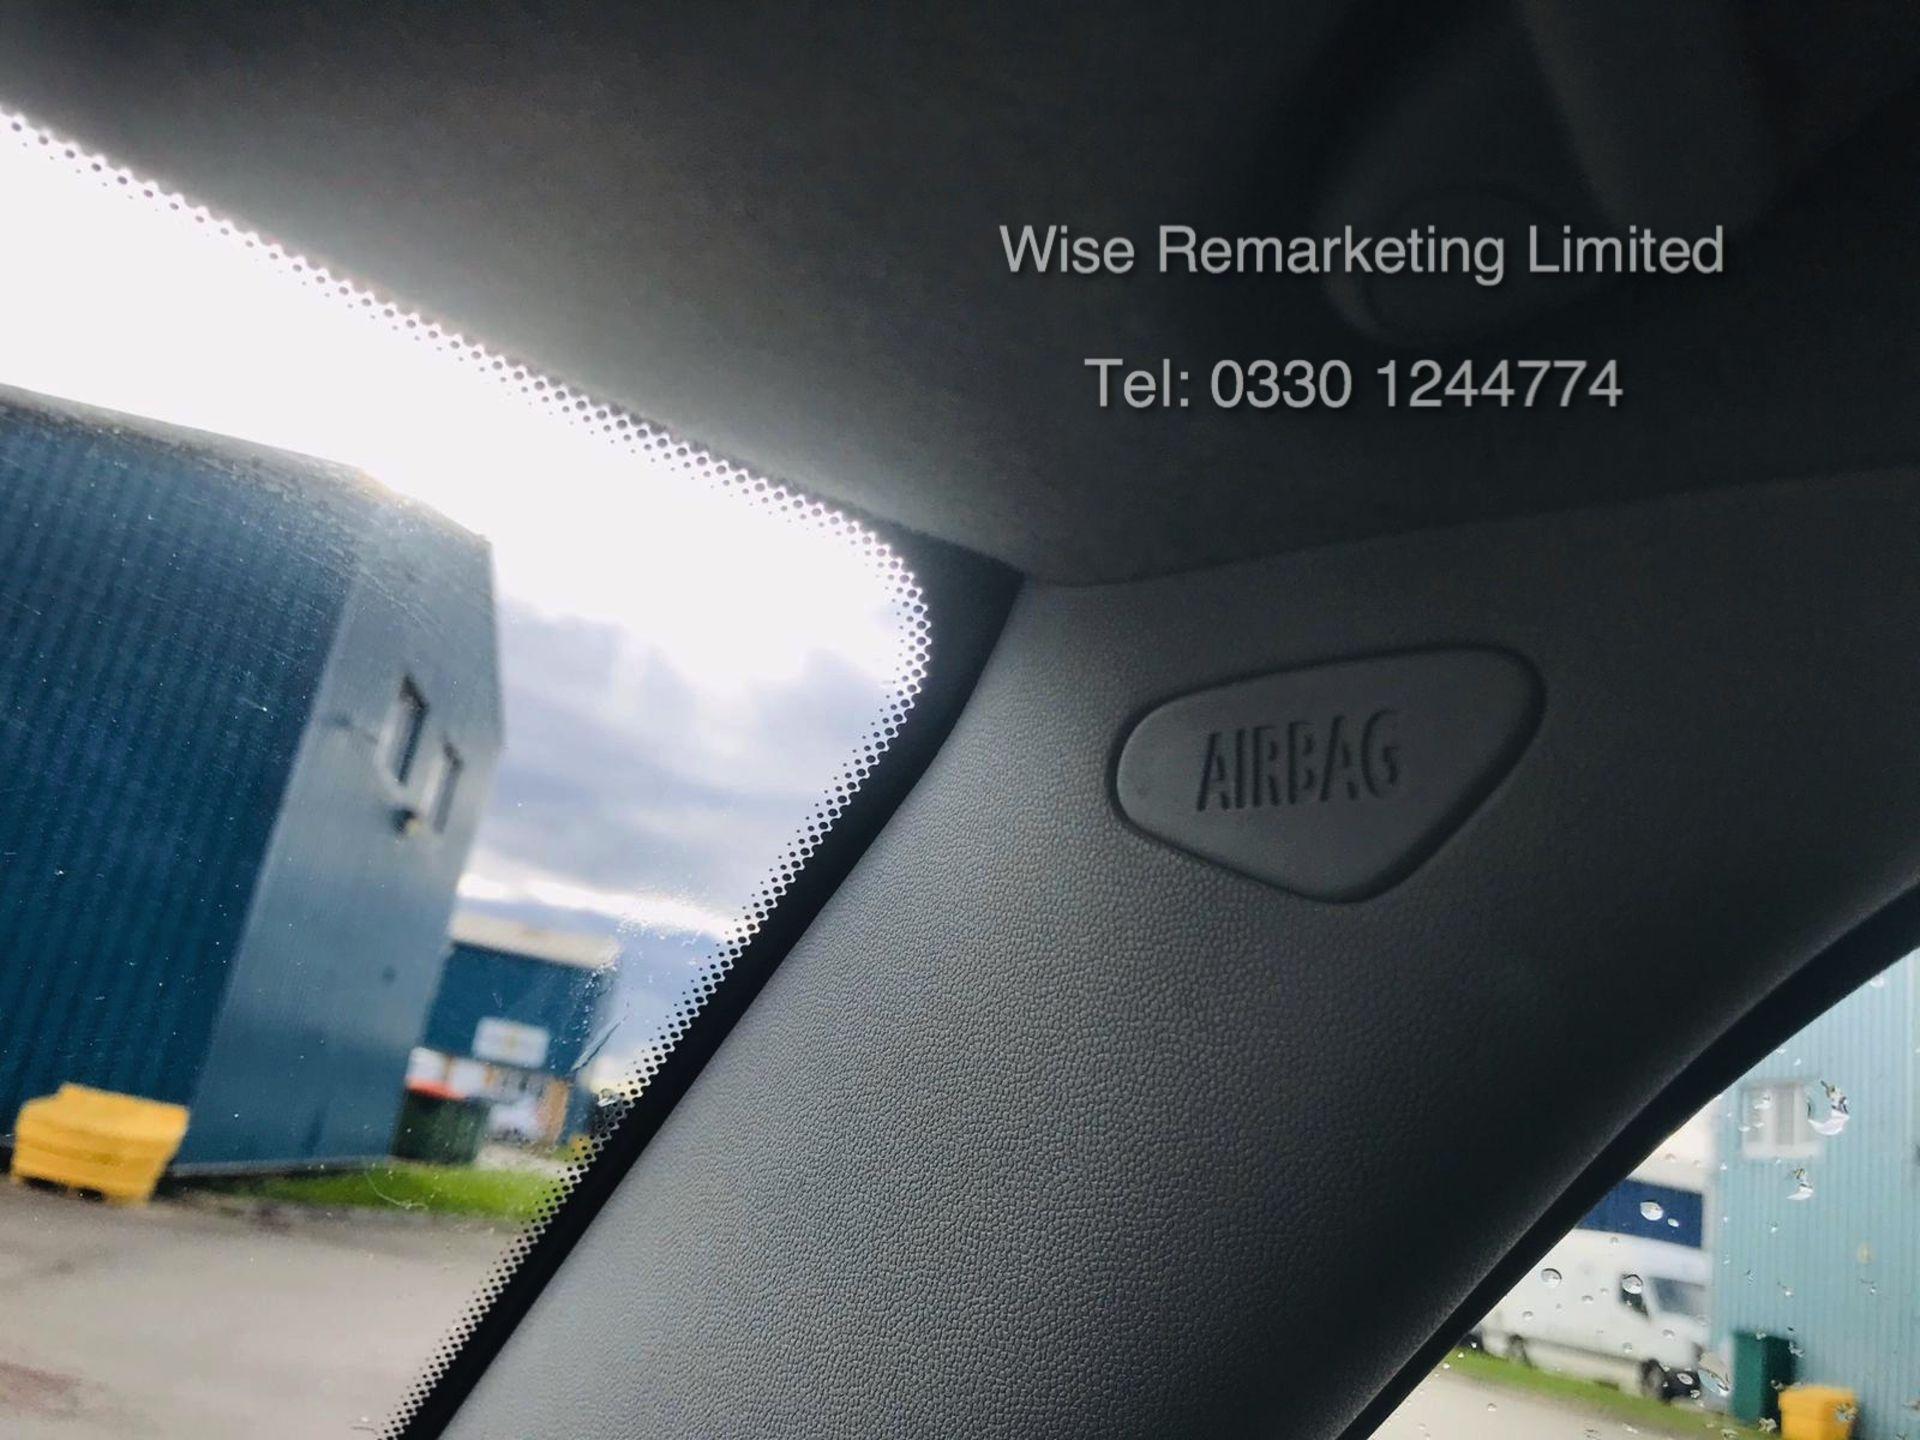 (RESERVE MET) Mini Cooper 1.4l One - 2008 Model - Service History - Air Con - White - Image 15 of 23